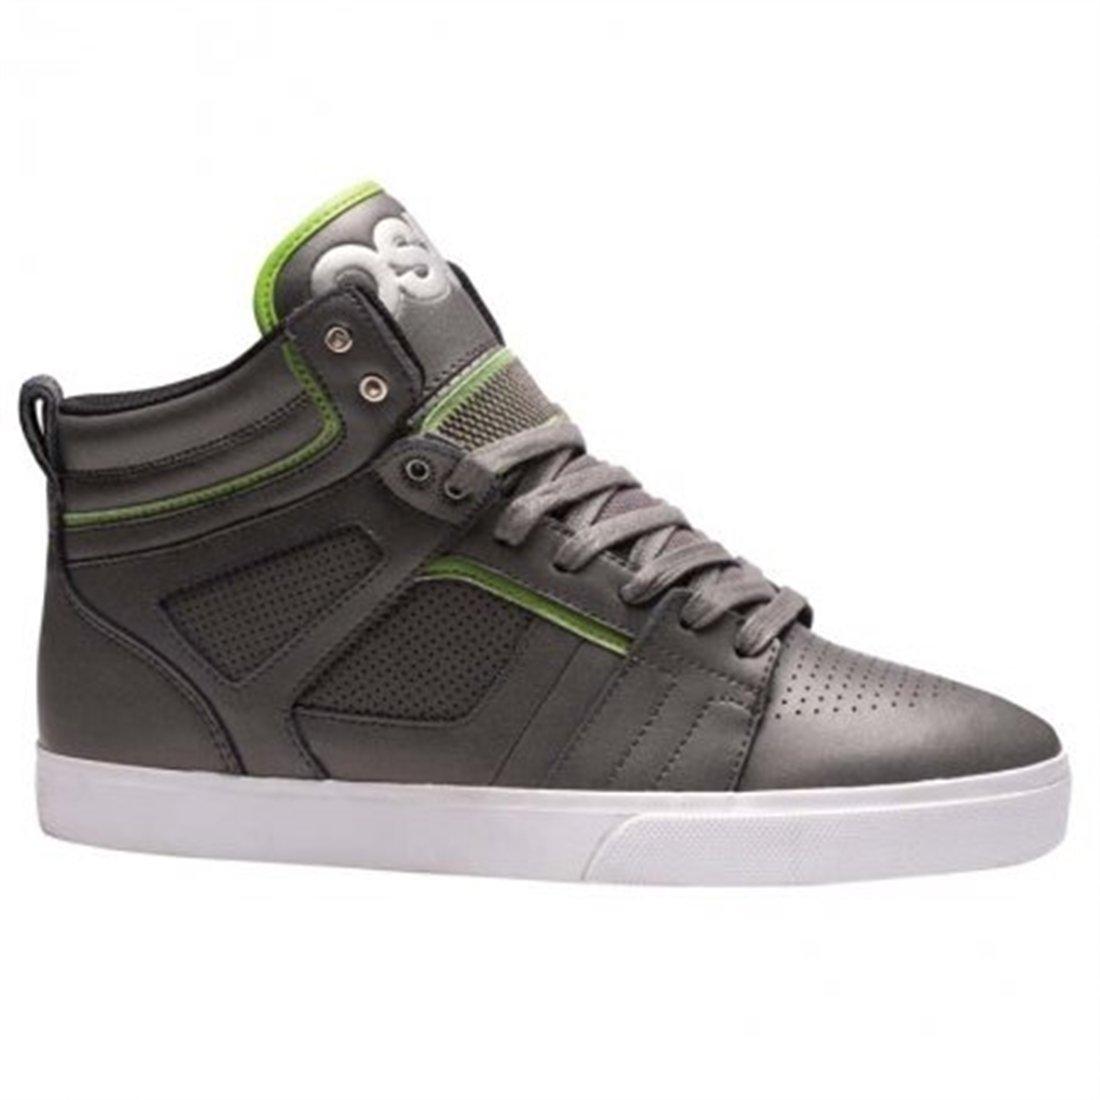 c2a1755409fde Amazon.com: Osiris Raider Shoes - Charcoal / Leaf / Black - UK 11 ...